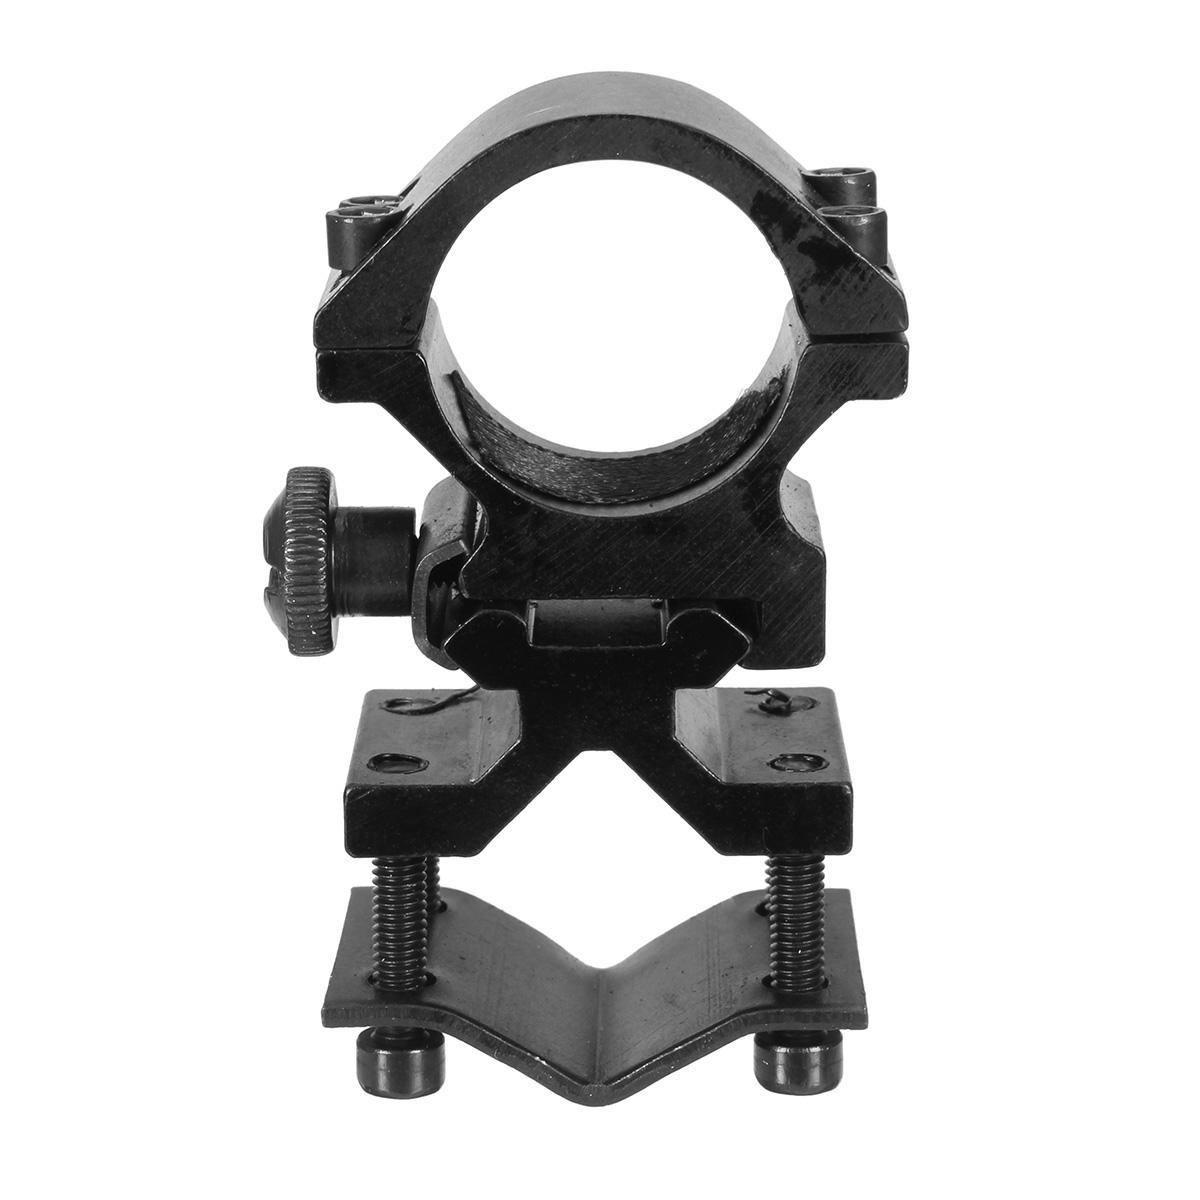 K185 Flashlight Clip Optical Sight Bracket Holder Support ScopE Mount Ring фото